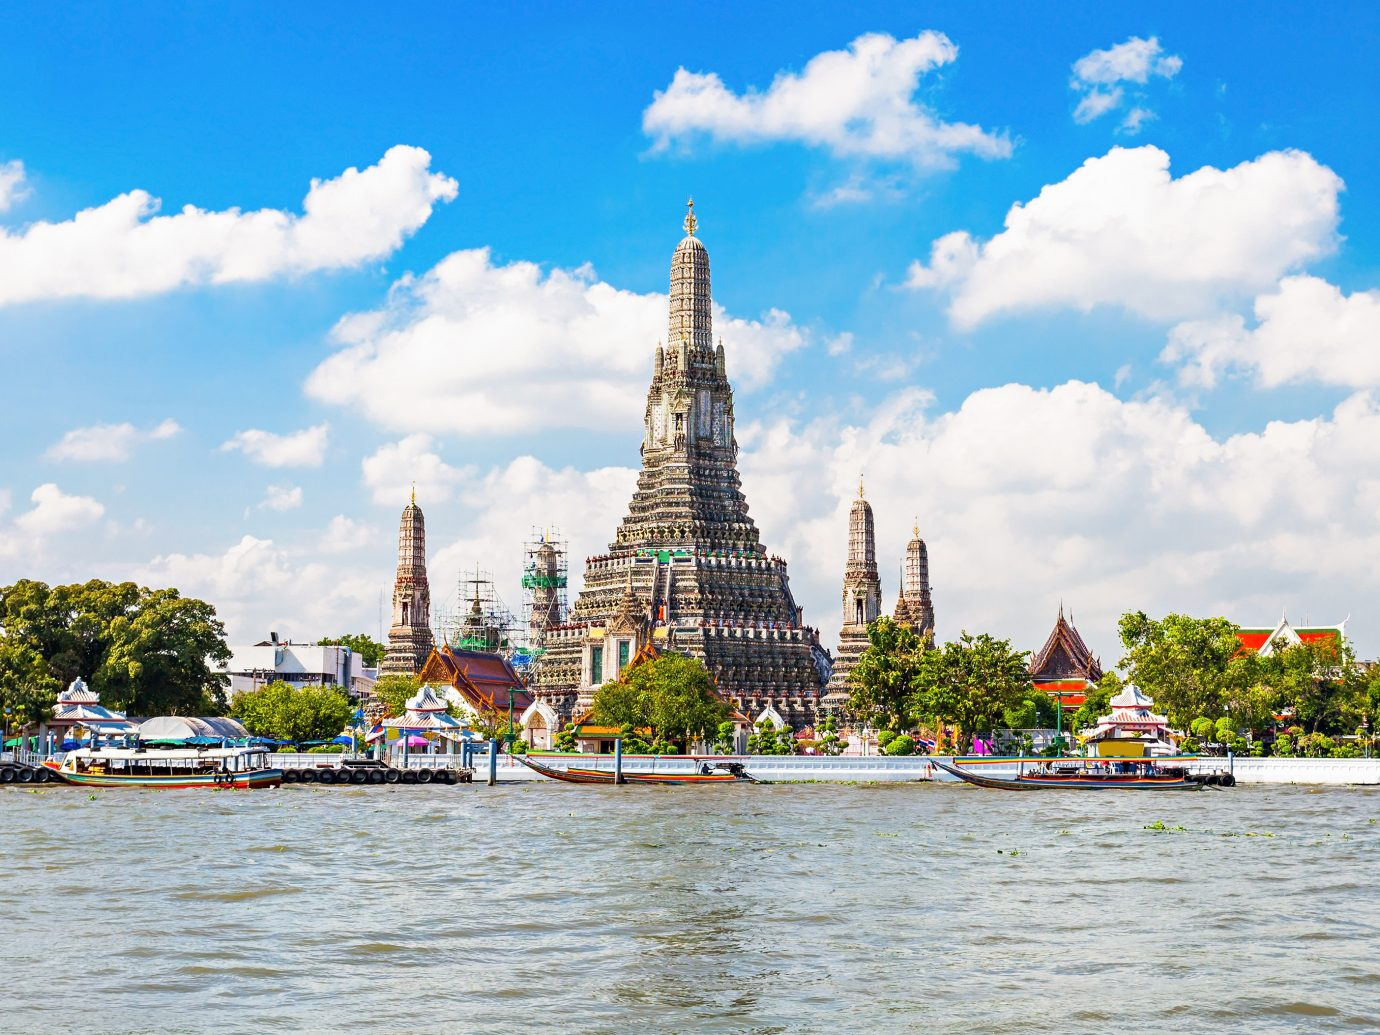 Wat Arun Buddhist temple in Bangkok, Thailand